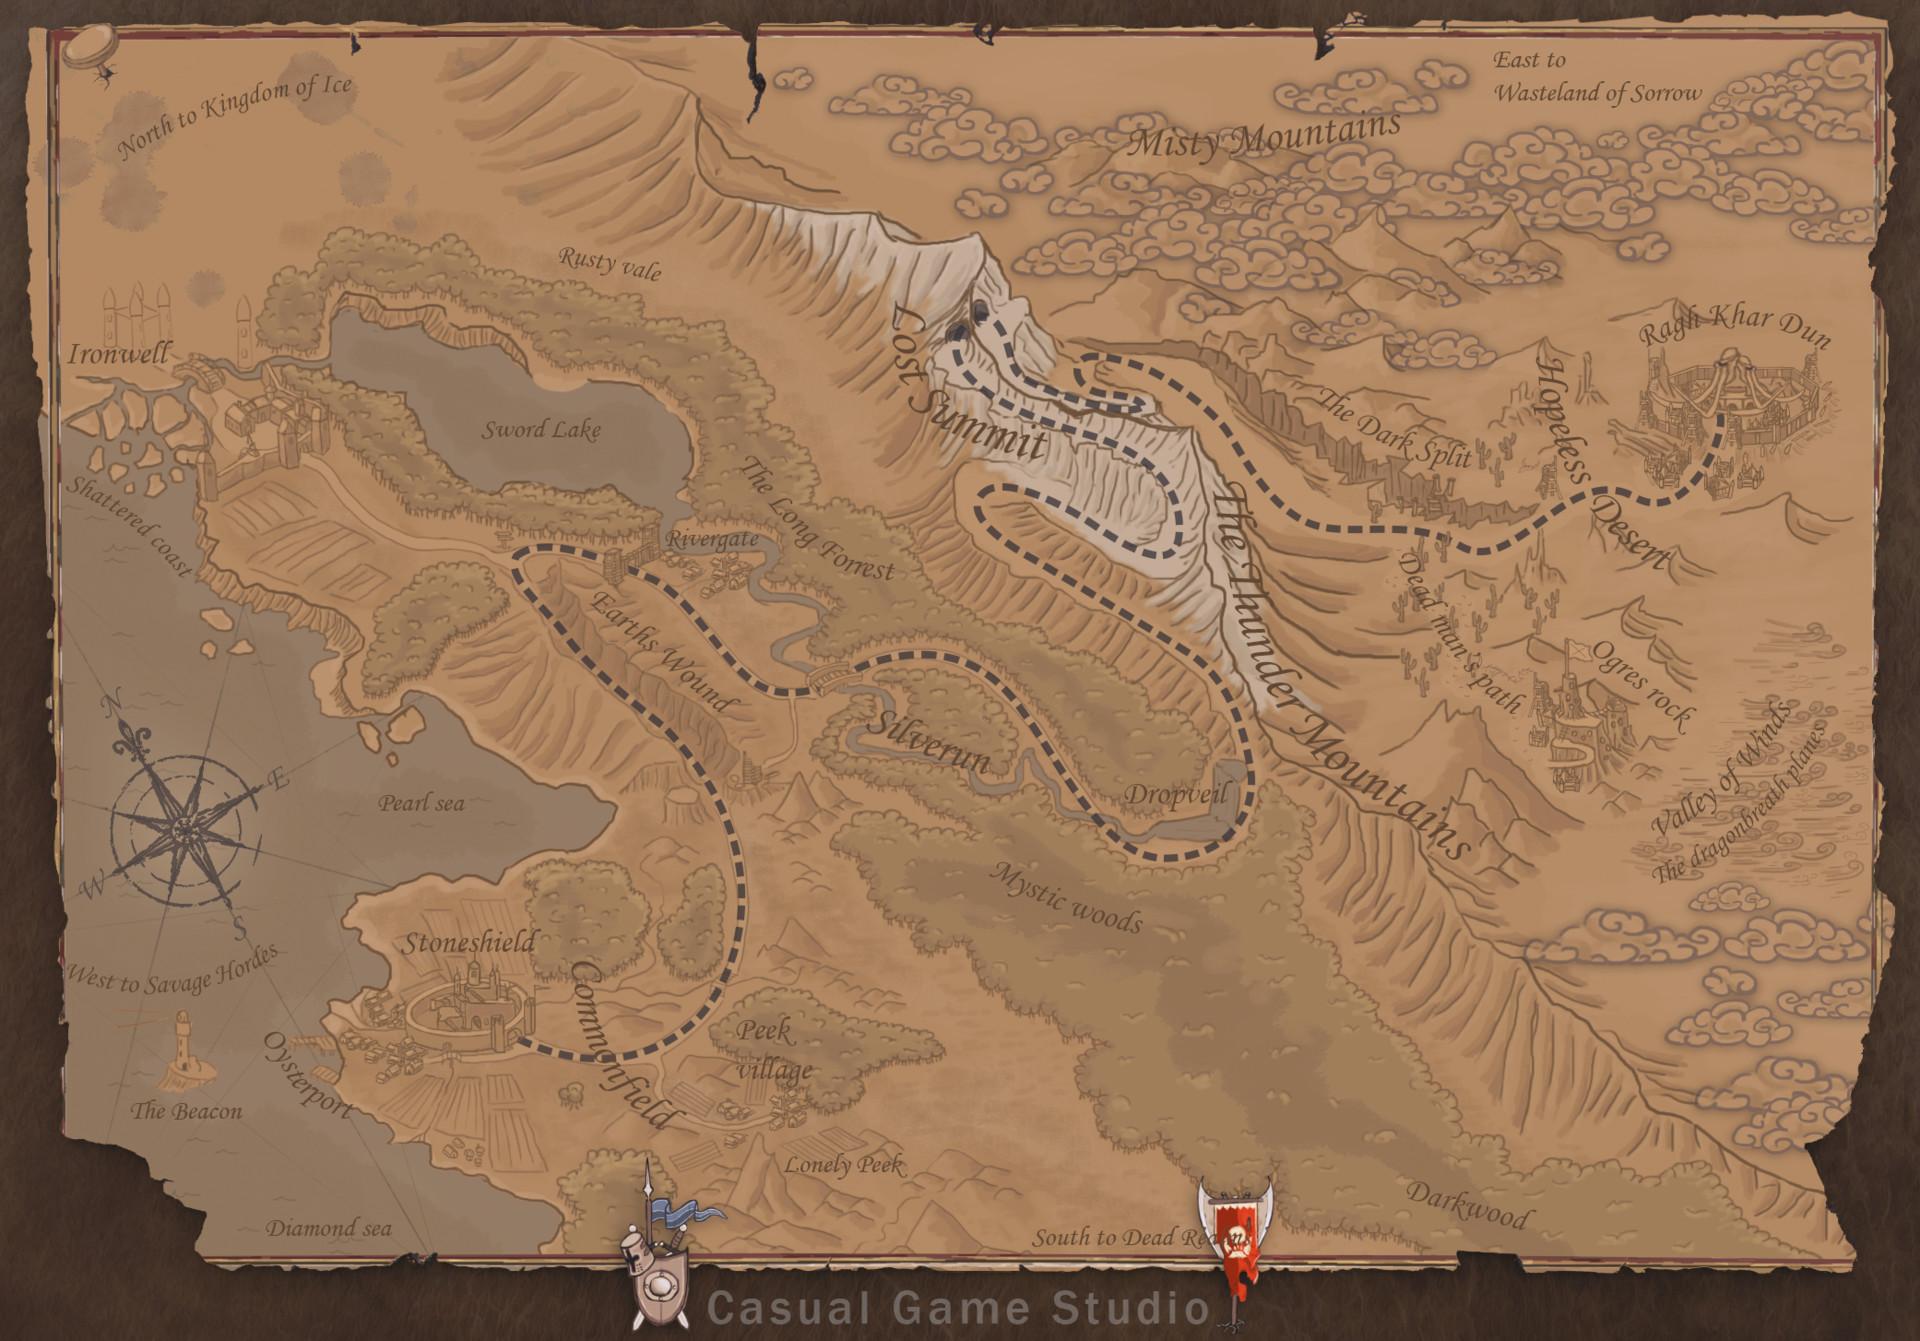 ArtStation - Tower Defense Game Campain Map, Boris Stajic on